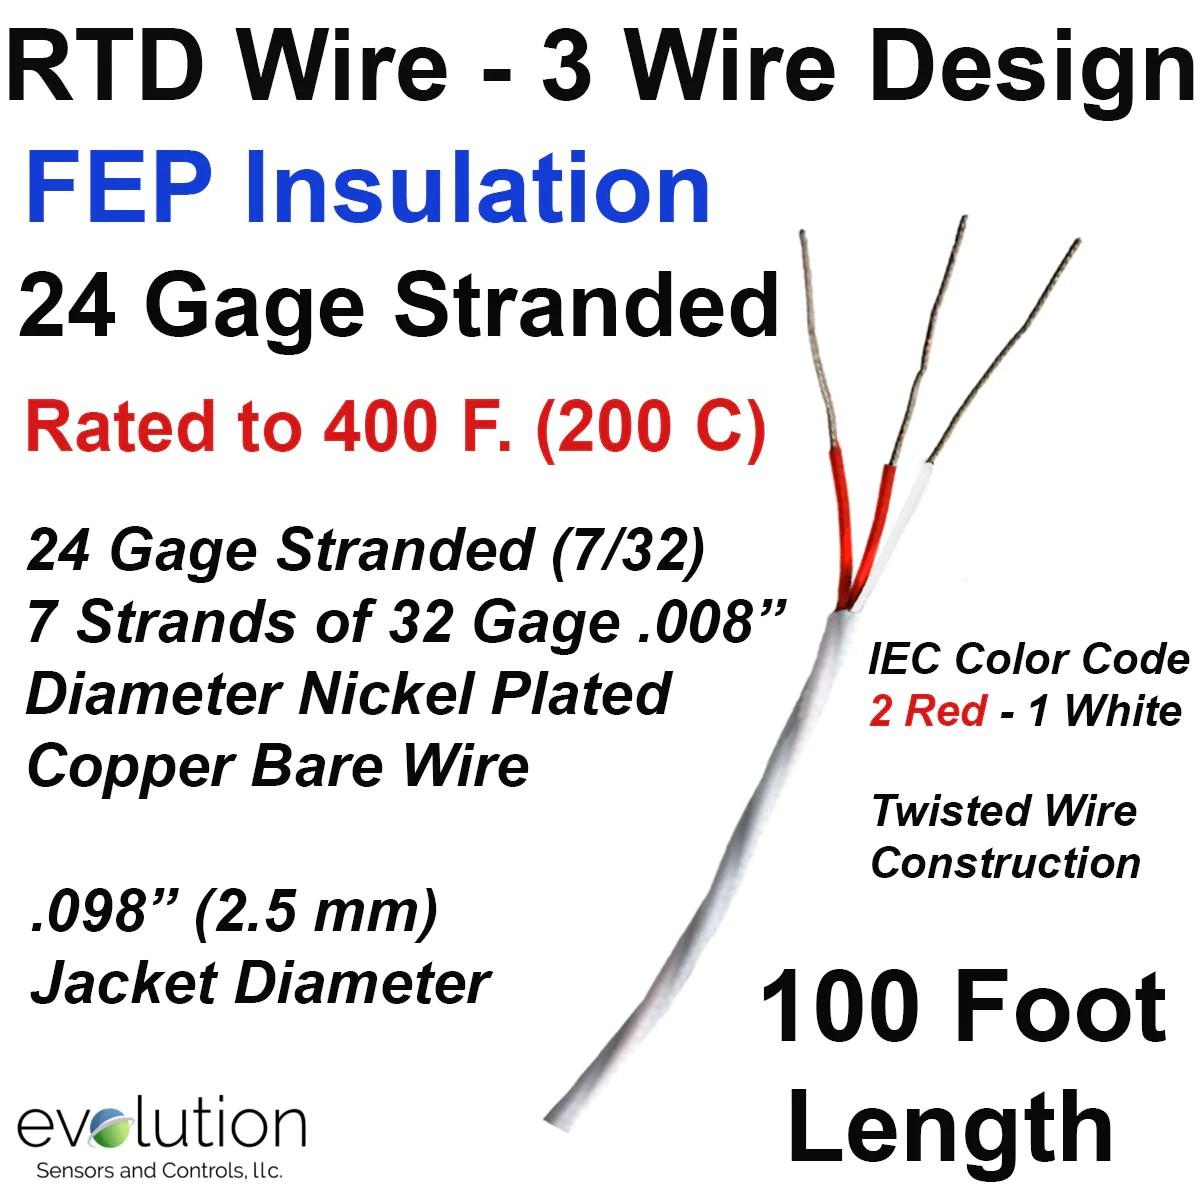 medium resolution of rtd wiring color code wiring diagram show rtd wire color code rtd wiring color code